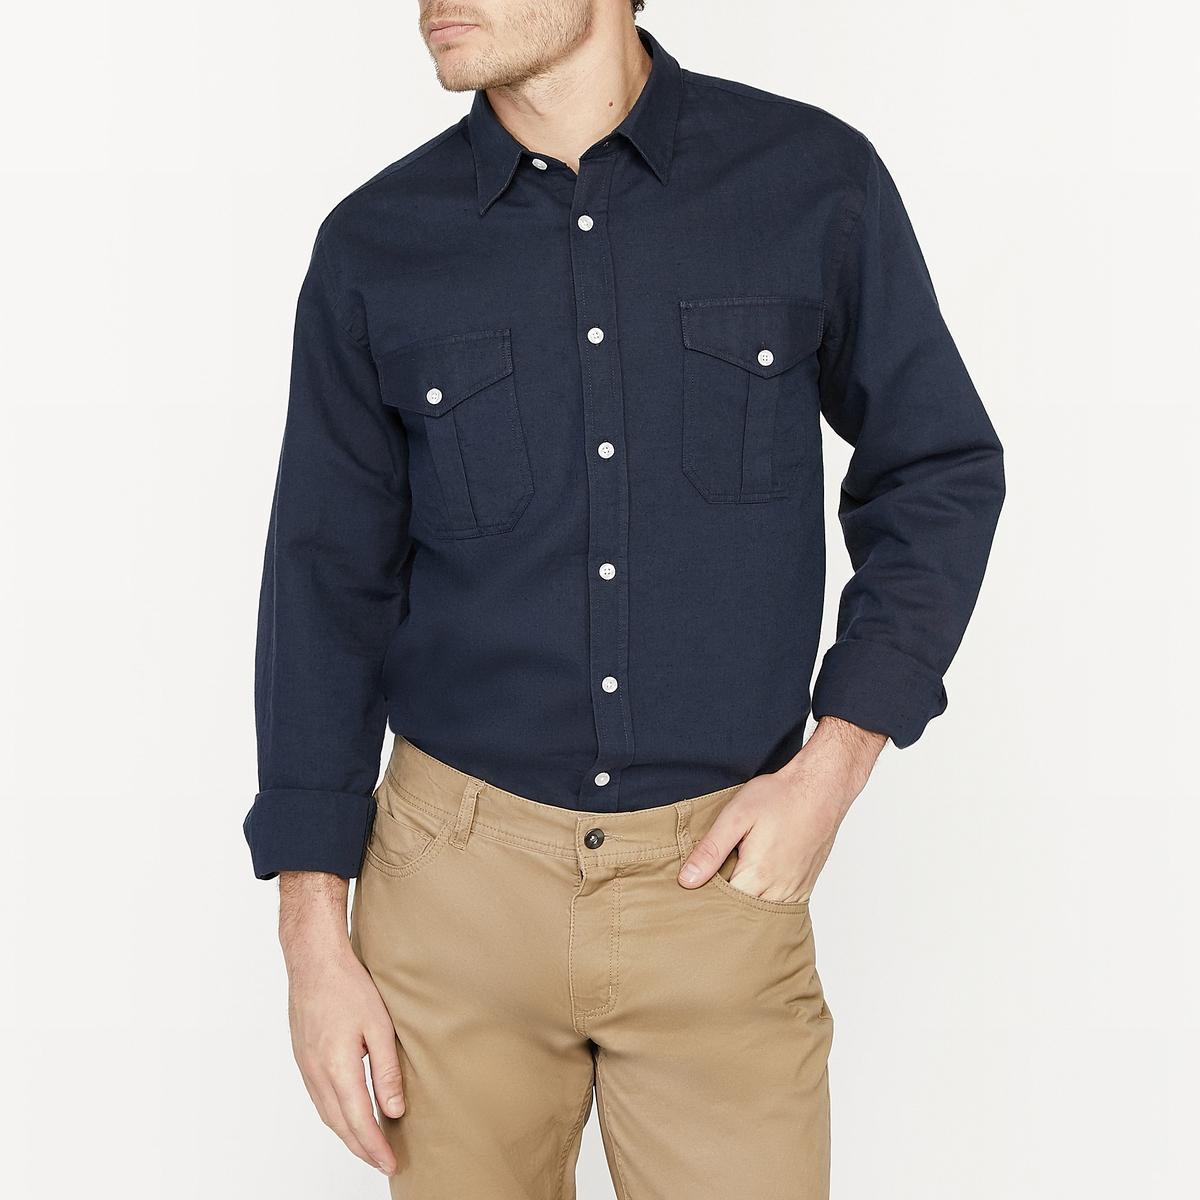 Рубашка прямого покроя из льна меланж